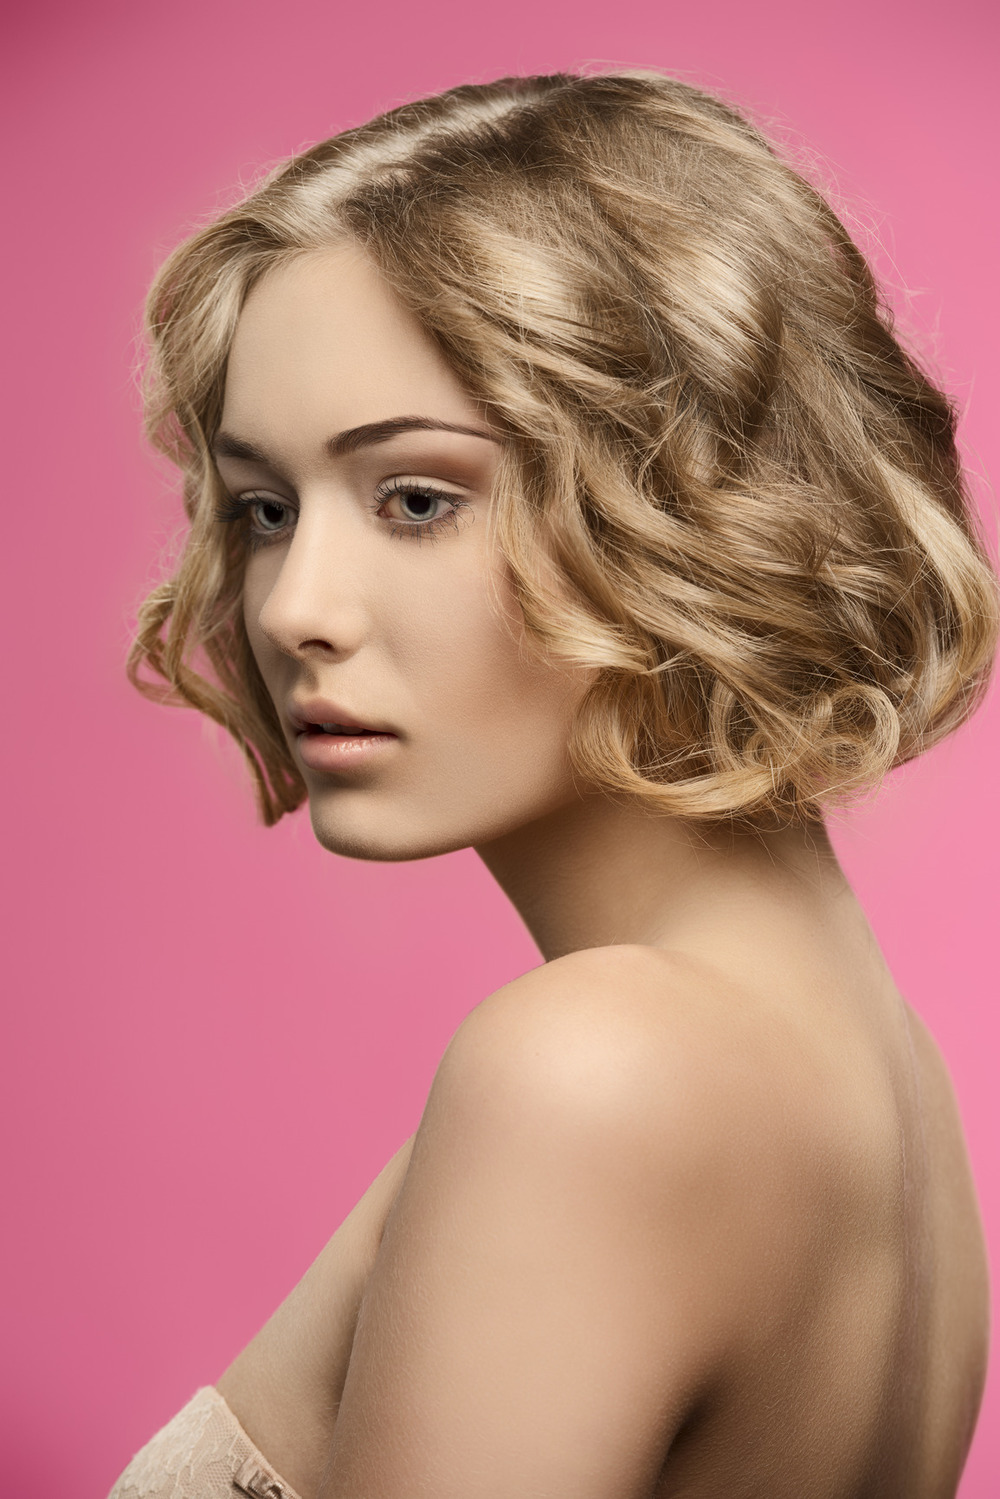 photodune-9115903-beauty-girl-with-short-curly-hair-m.jpg